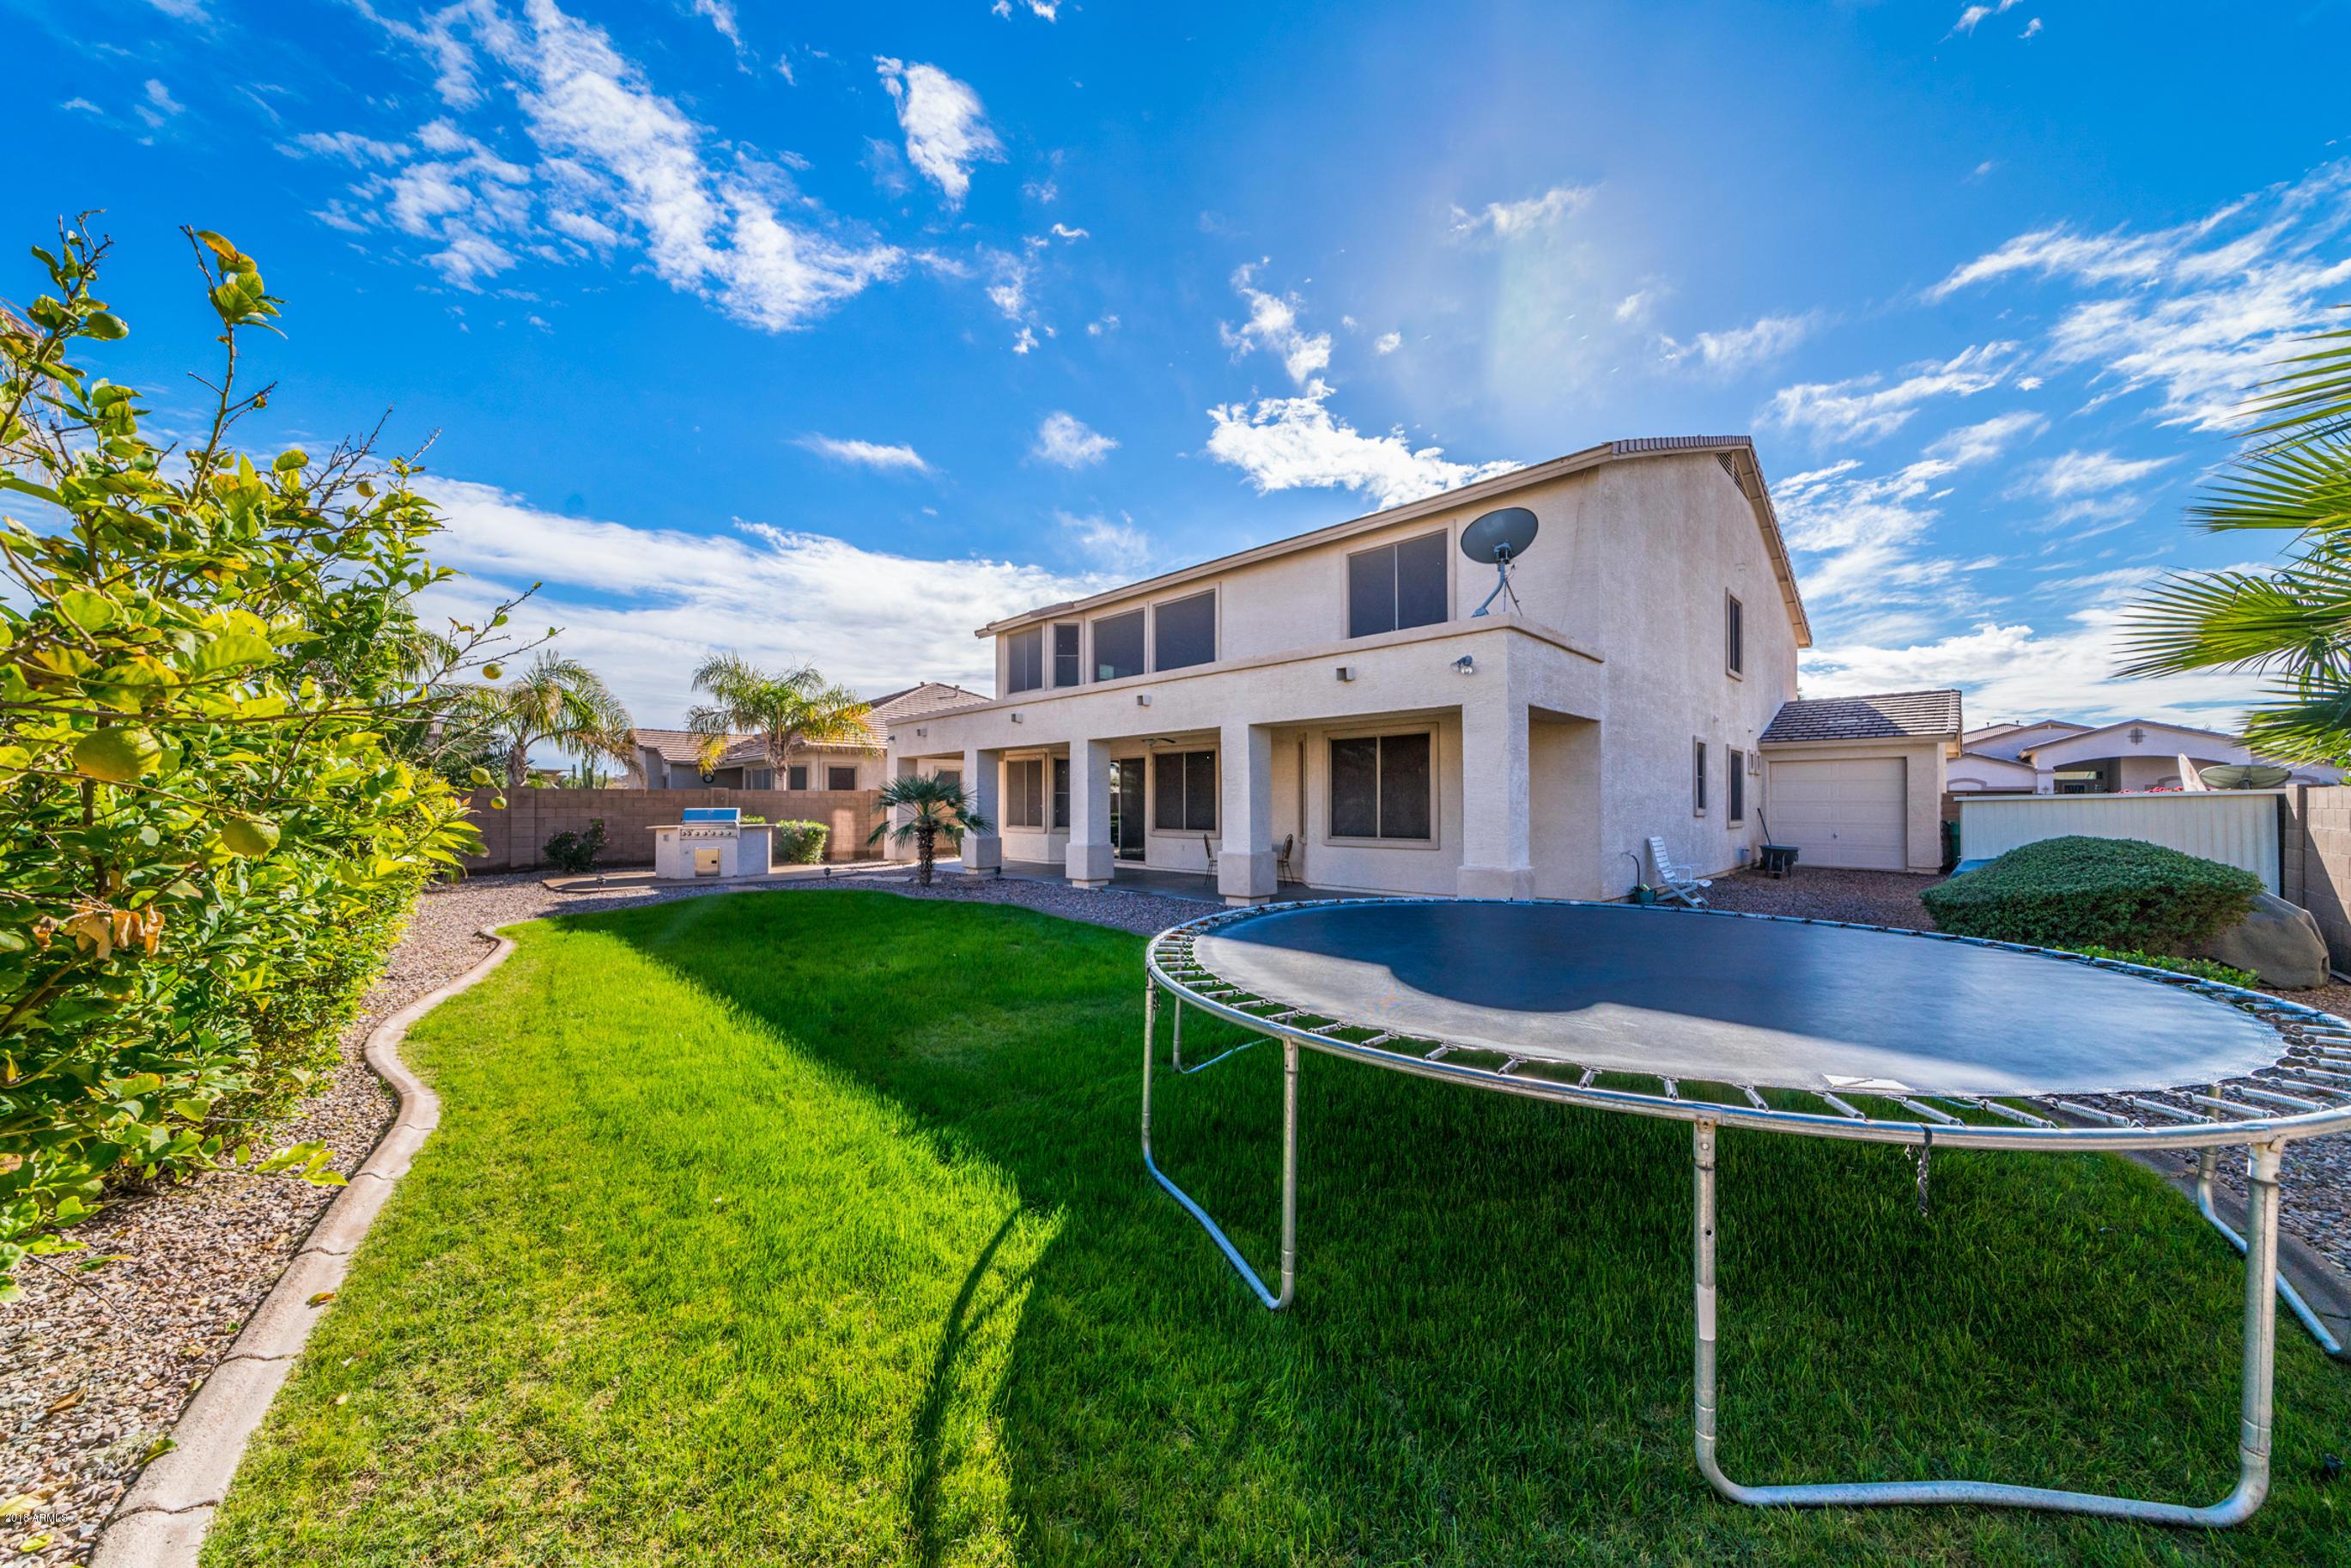 MLS 5857162 43240 W CAVEN Drive, Maricopa, AZ 85138 Maricopa AZ Four Bedroom